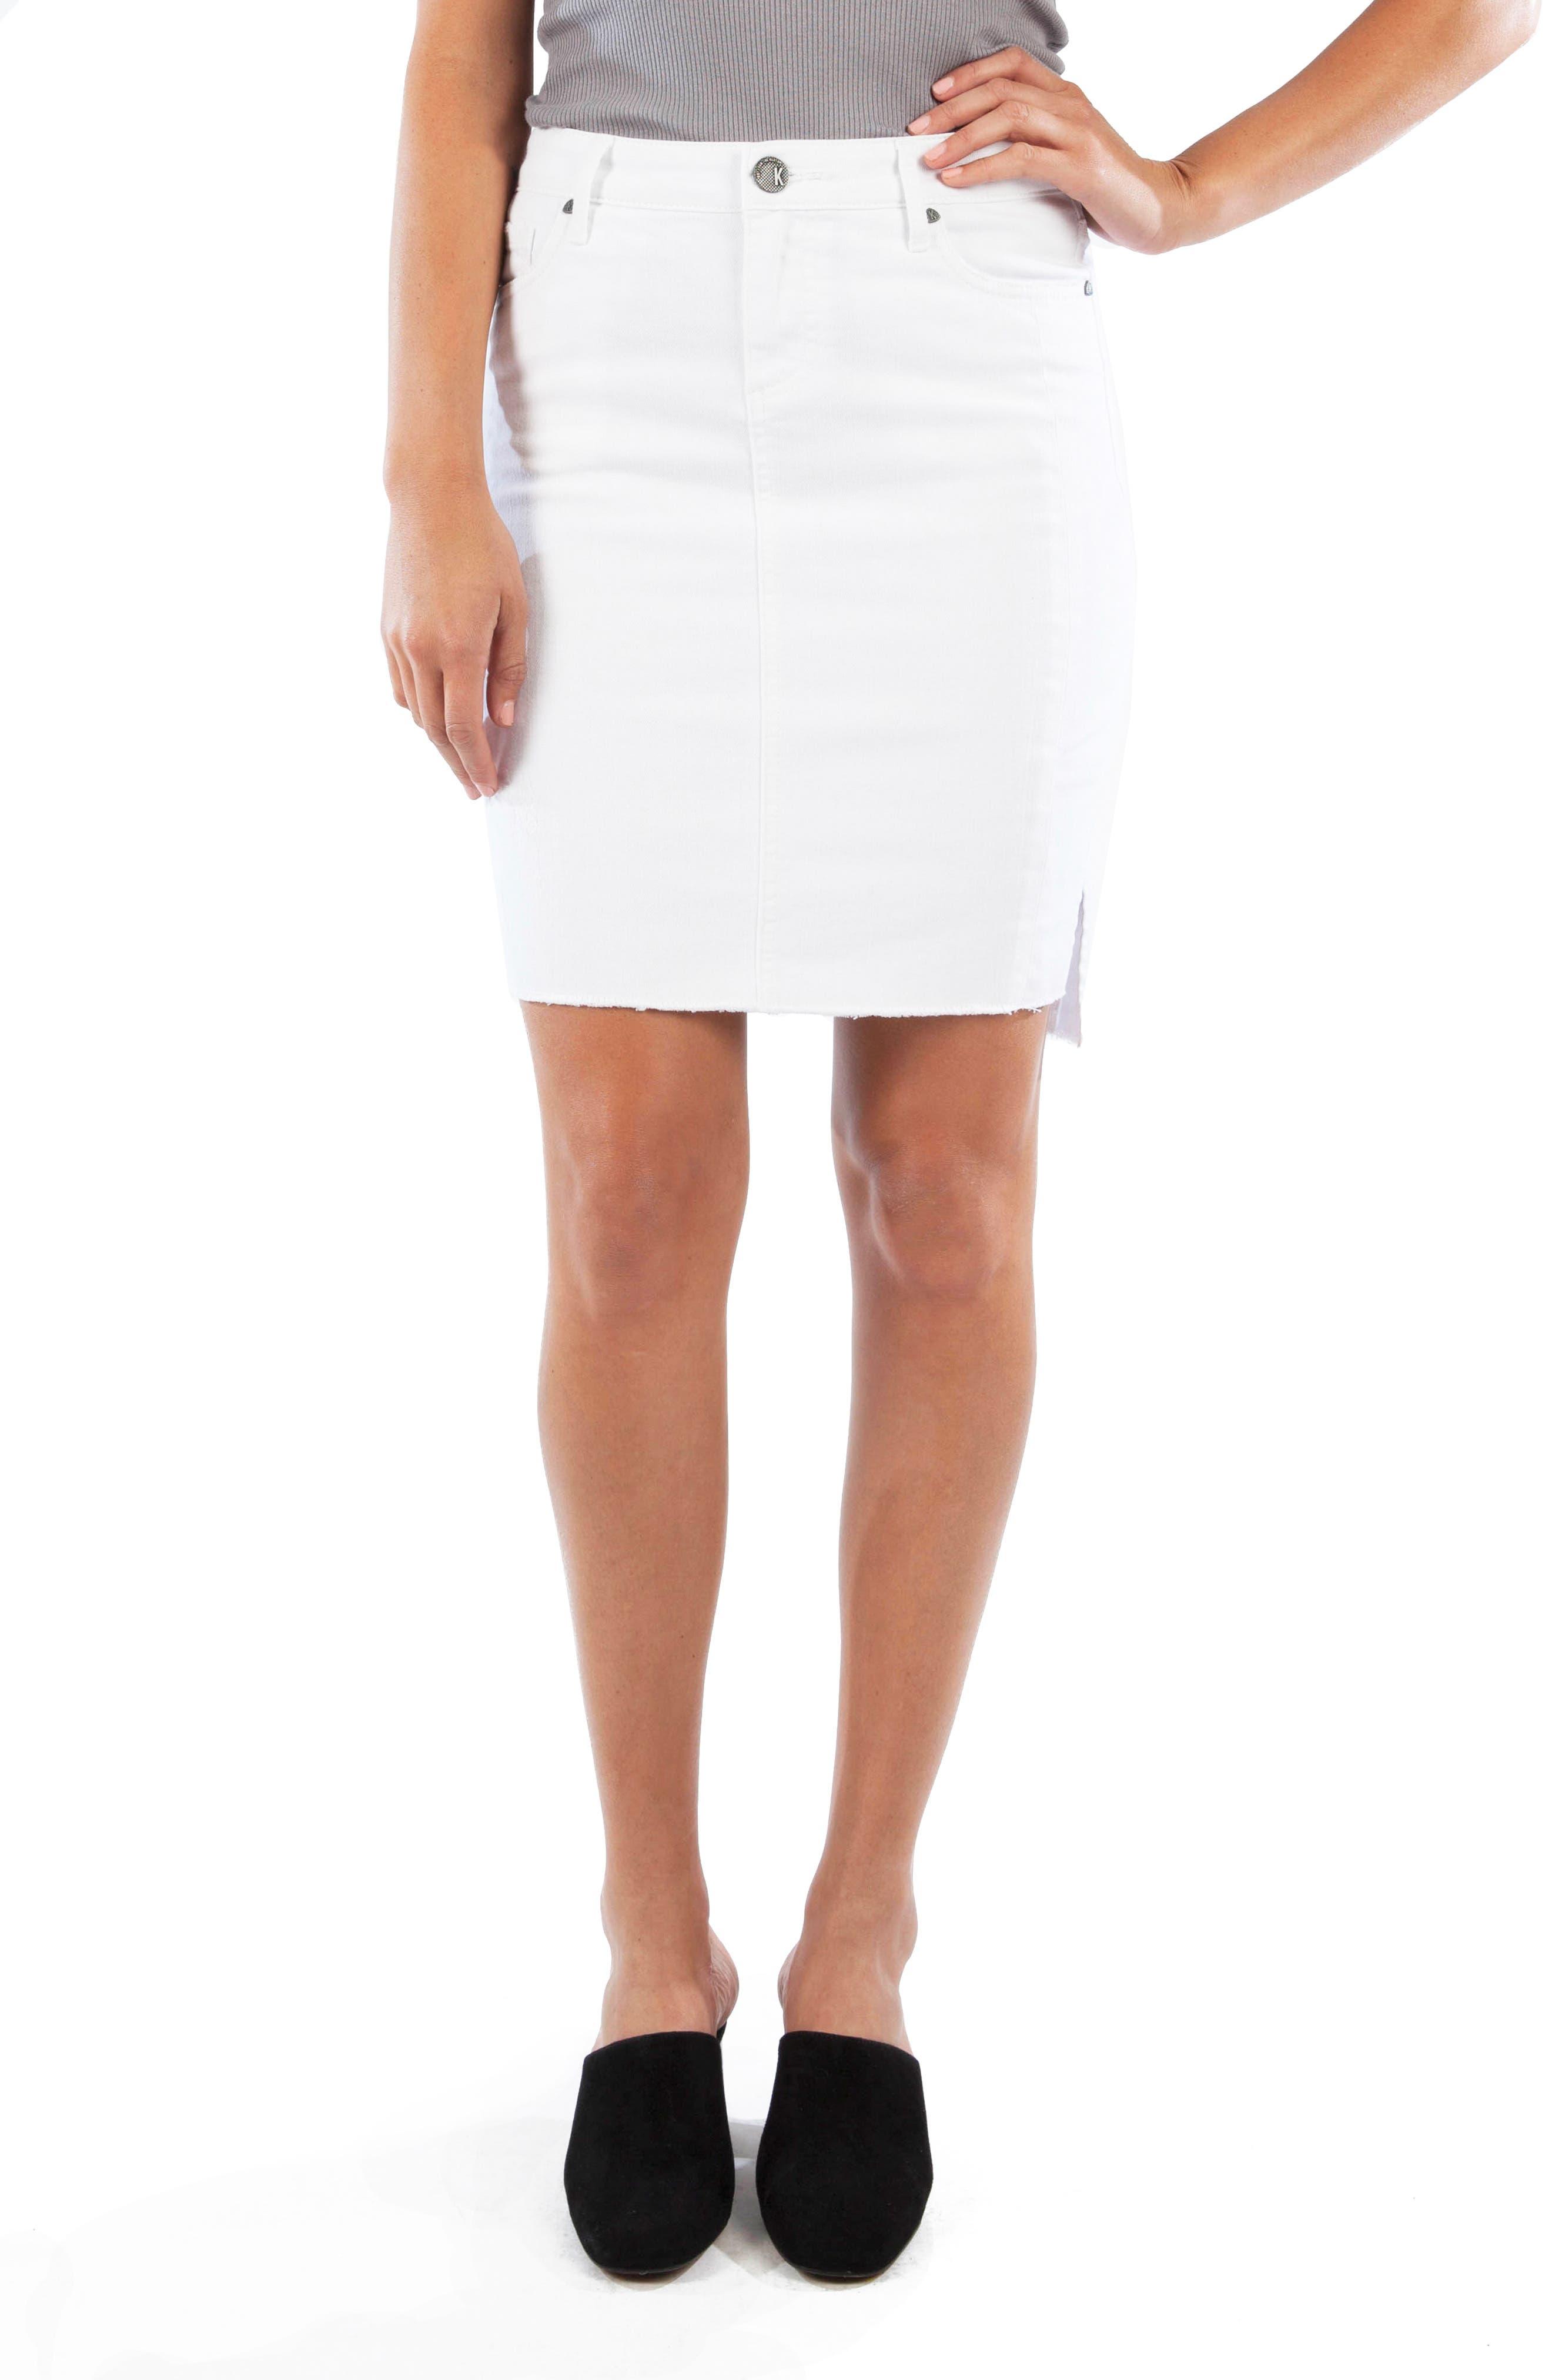 2019 Latest Design Light Pink Denim Mini Skirt A-line Destroyed Jeans Organic Cotton Medium 50%off Clients First Skirts Women's Clothing